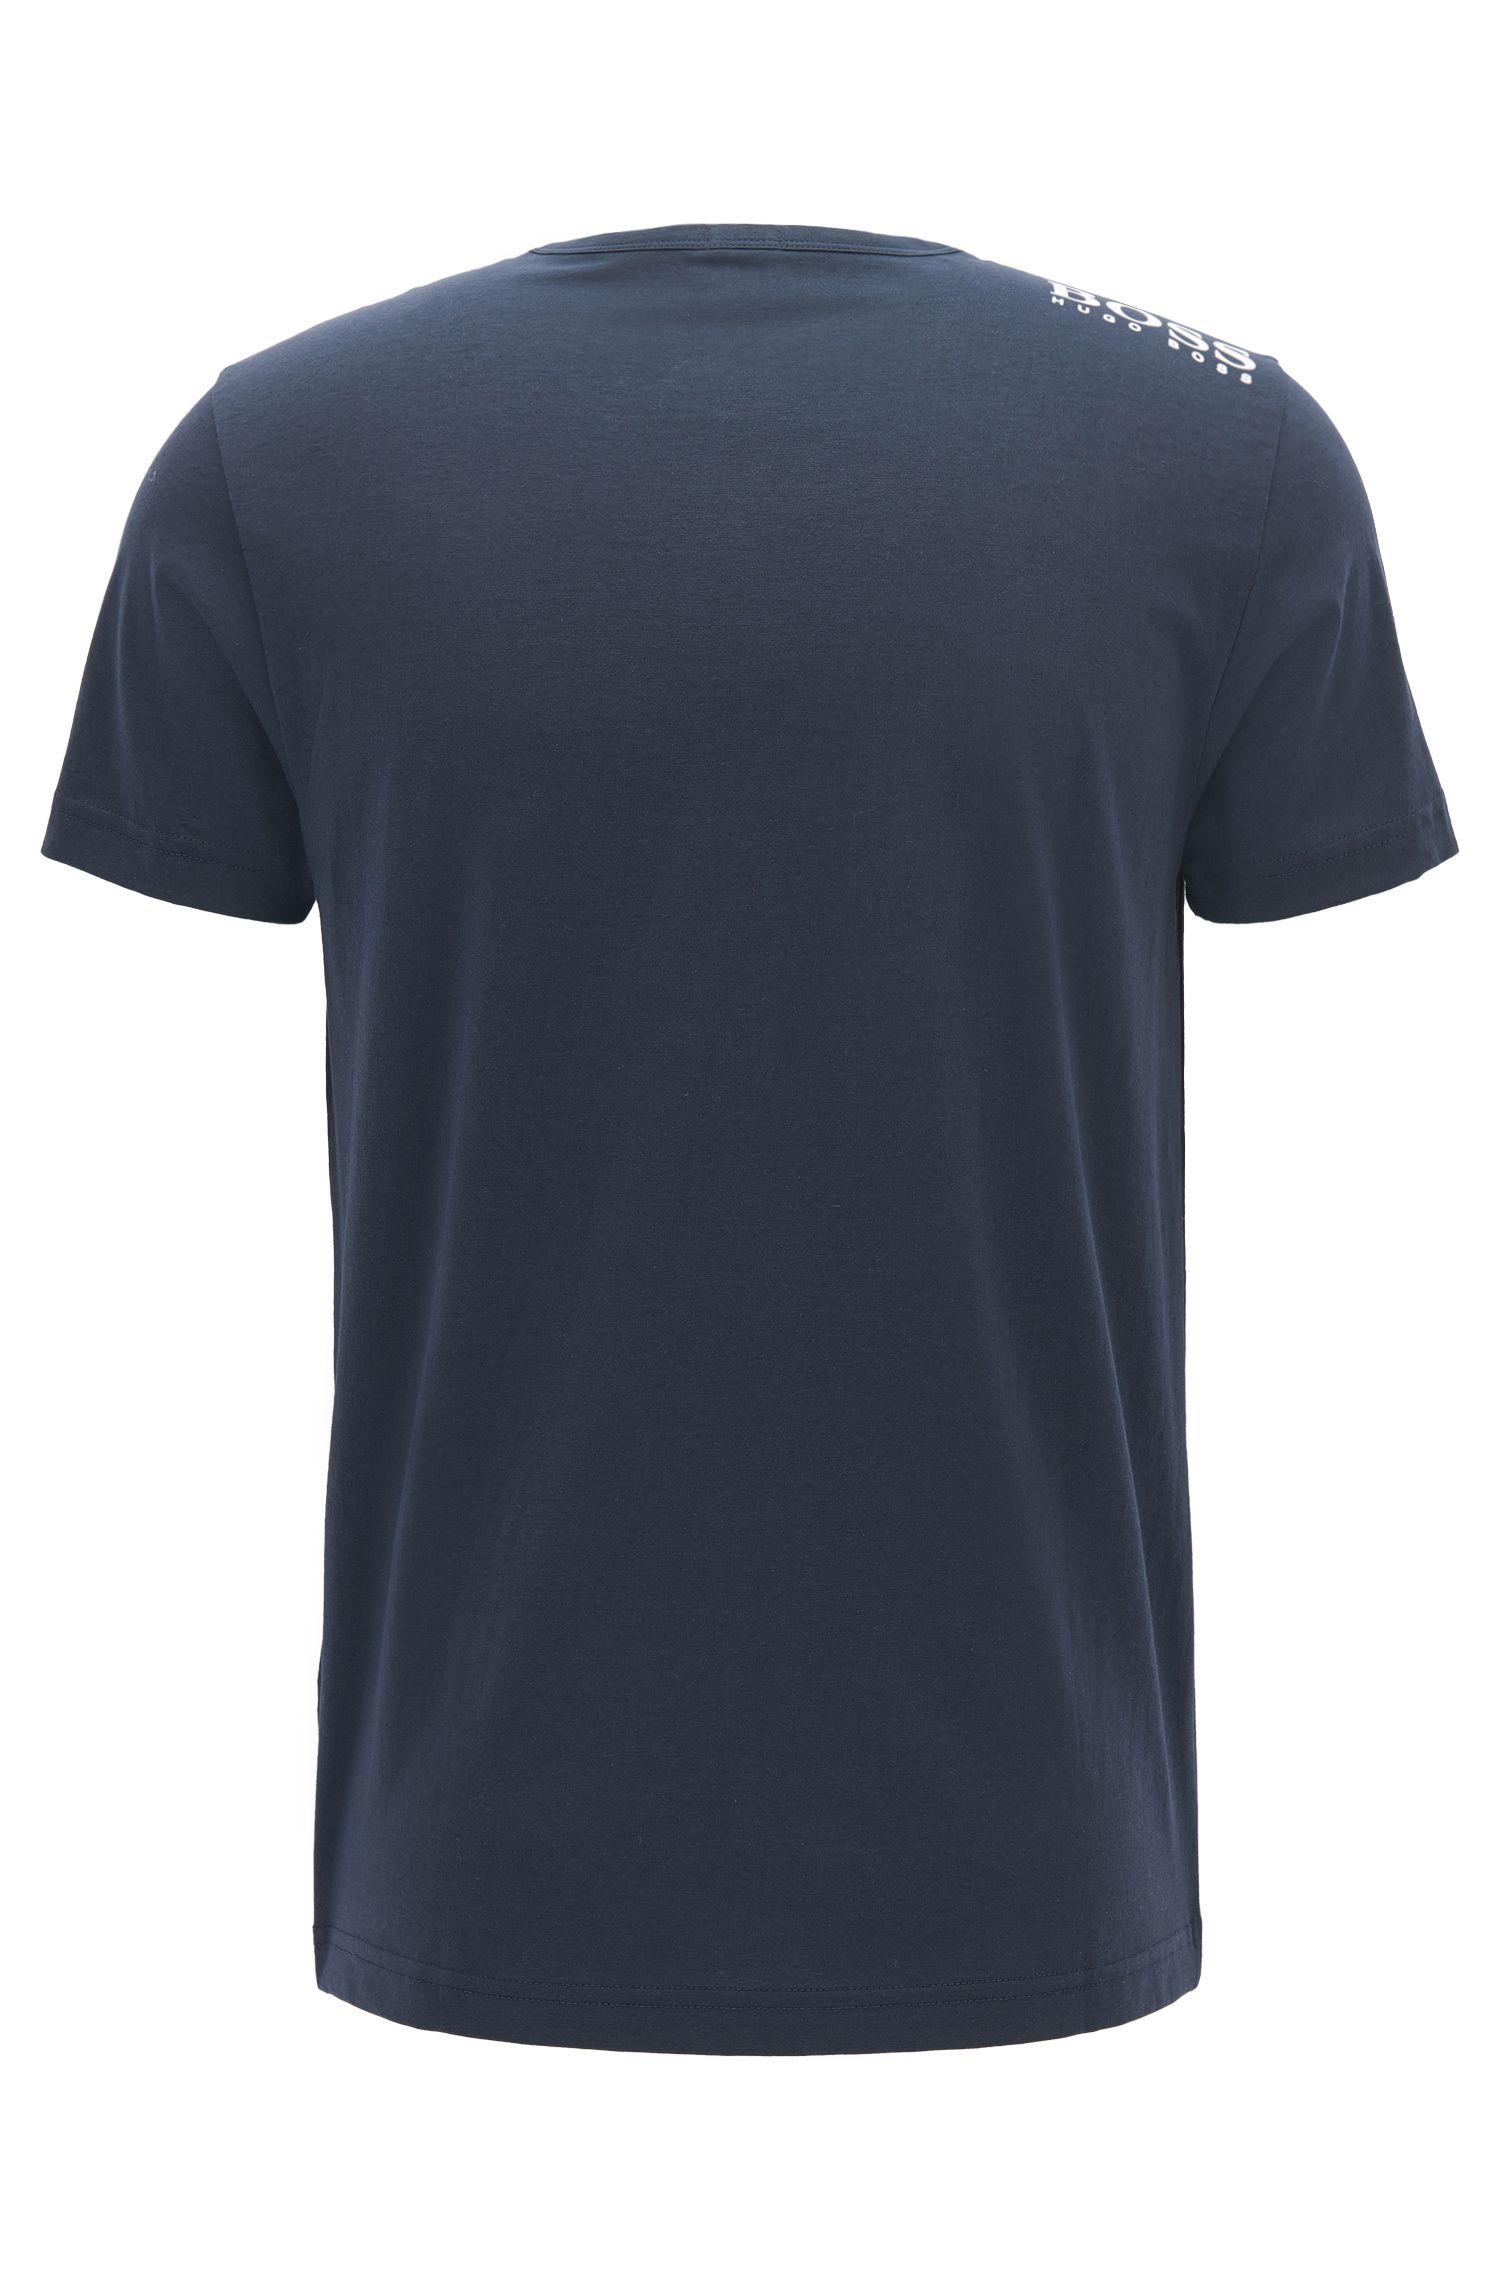 'Teevn' | Cotton V-Neck T-Shirt